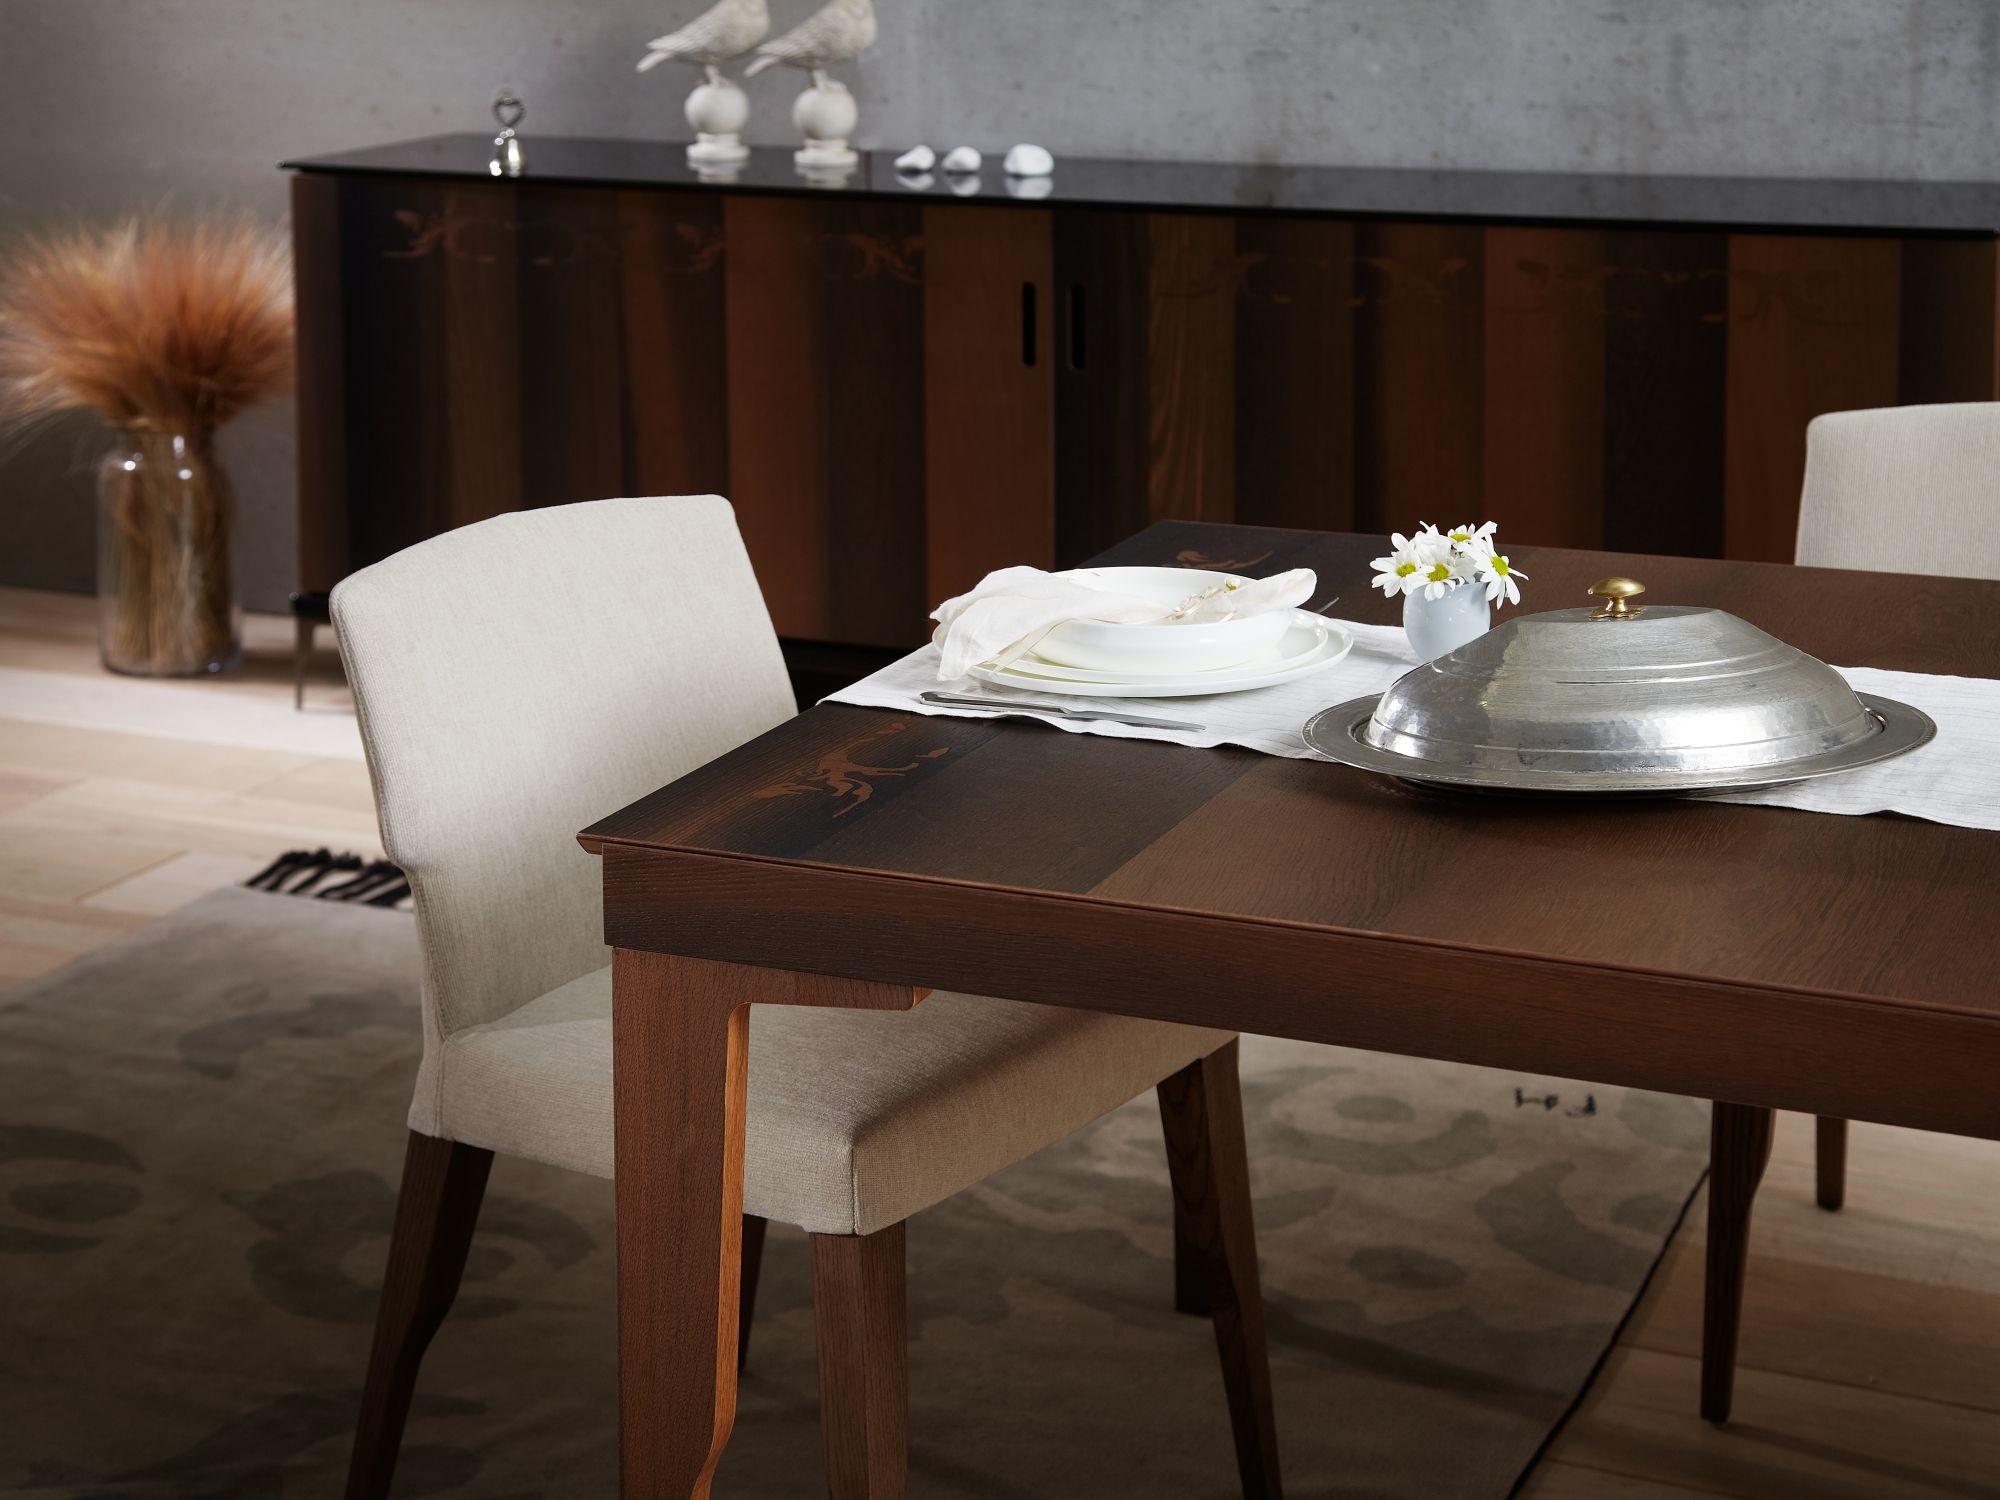 Koleksiyon Design Furniture Adli Kullanicinin Ev Mobilyalari Home Furniture Panosundaki Pin Mobilya Mobilya Fikirleri Evler